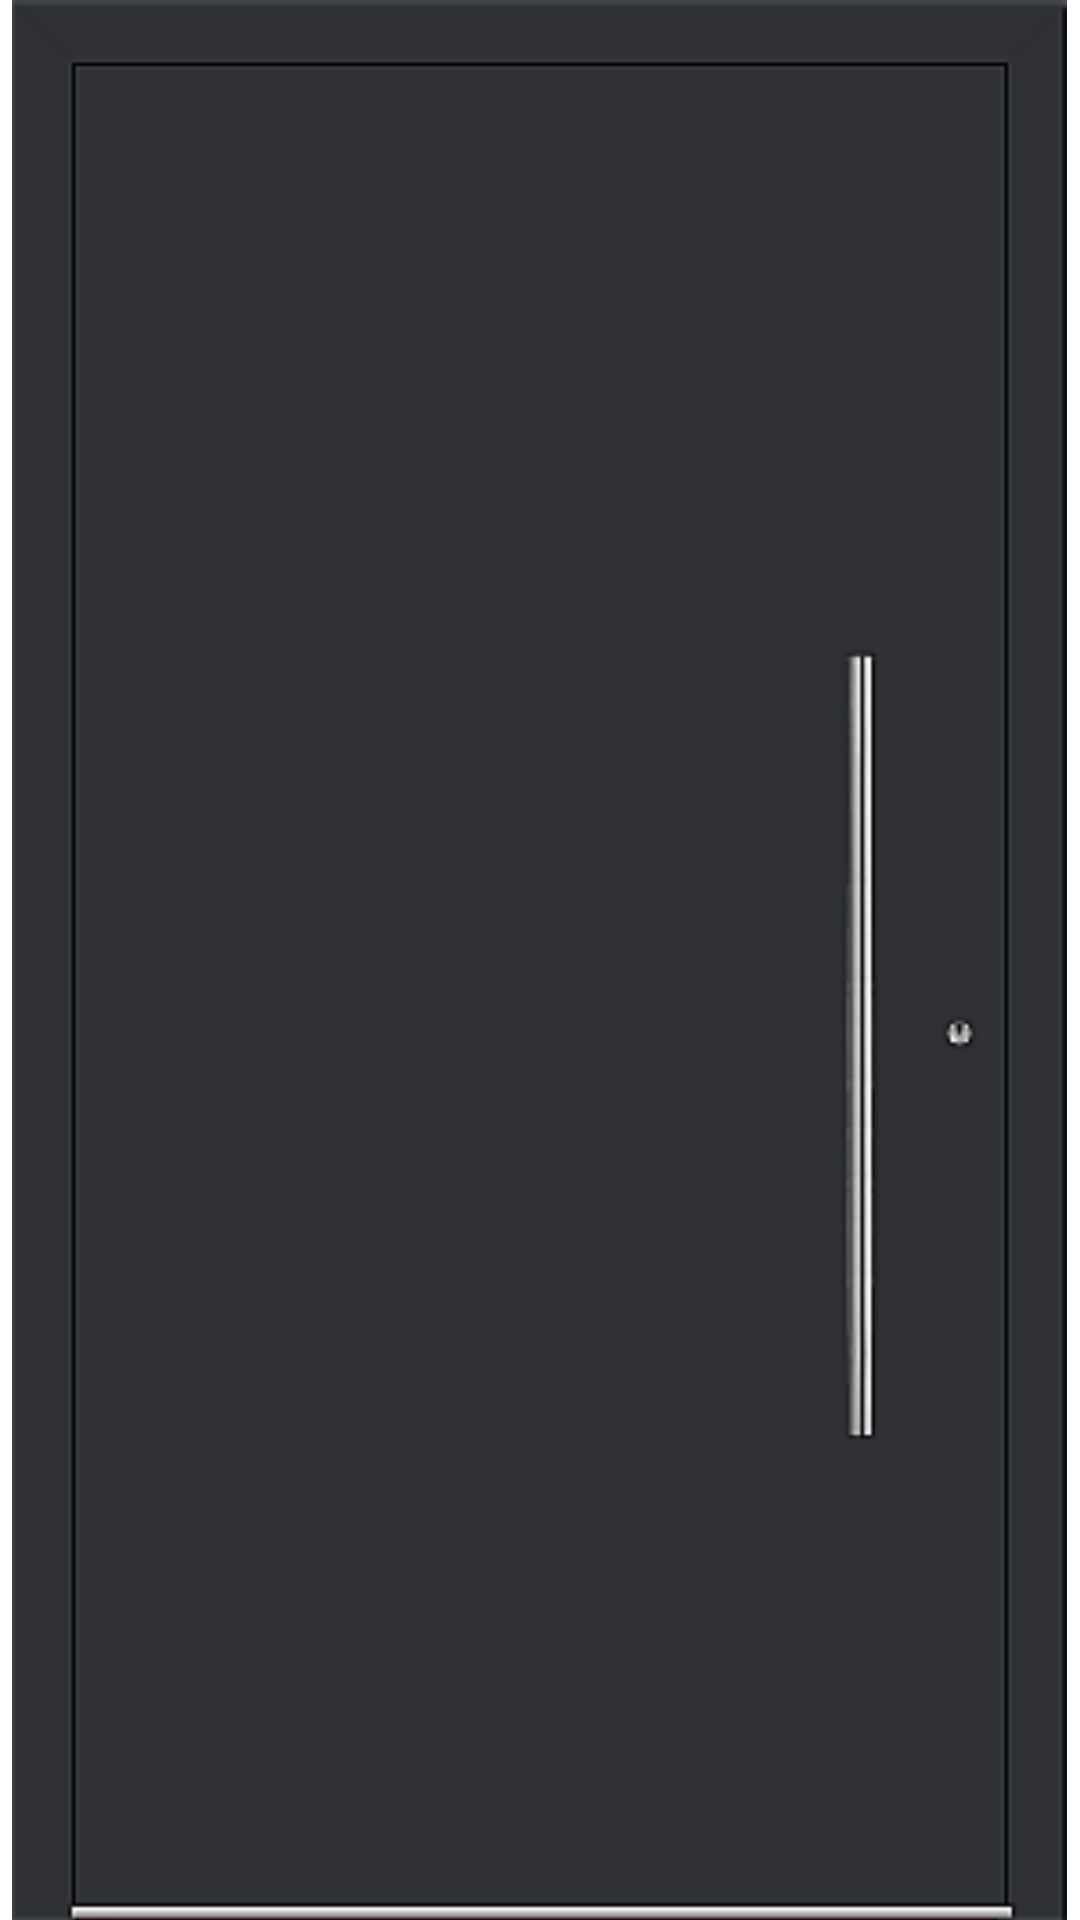 PaXentrée Aluminium Haustür M06001 schwarz